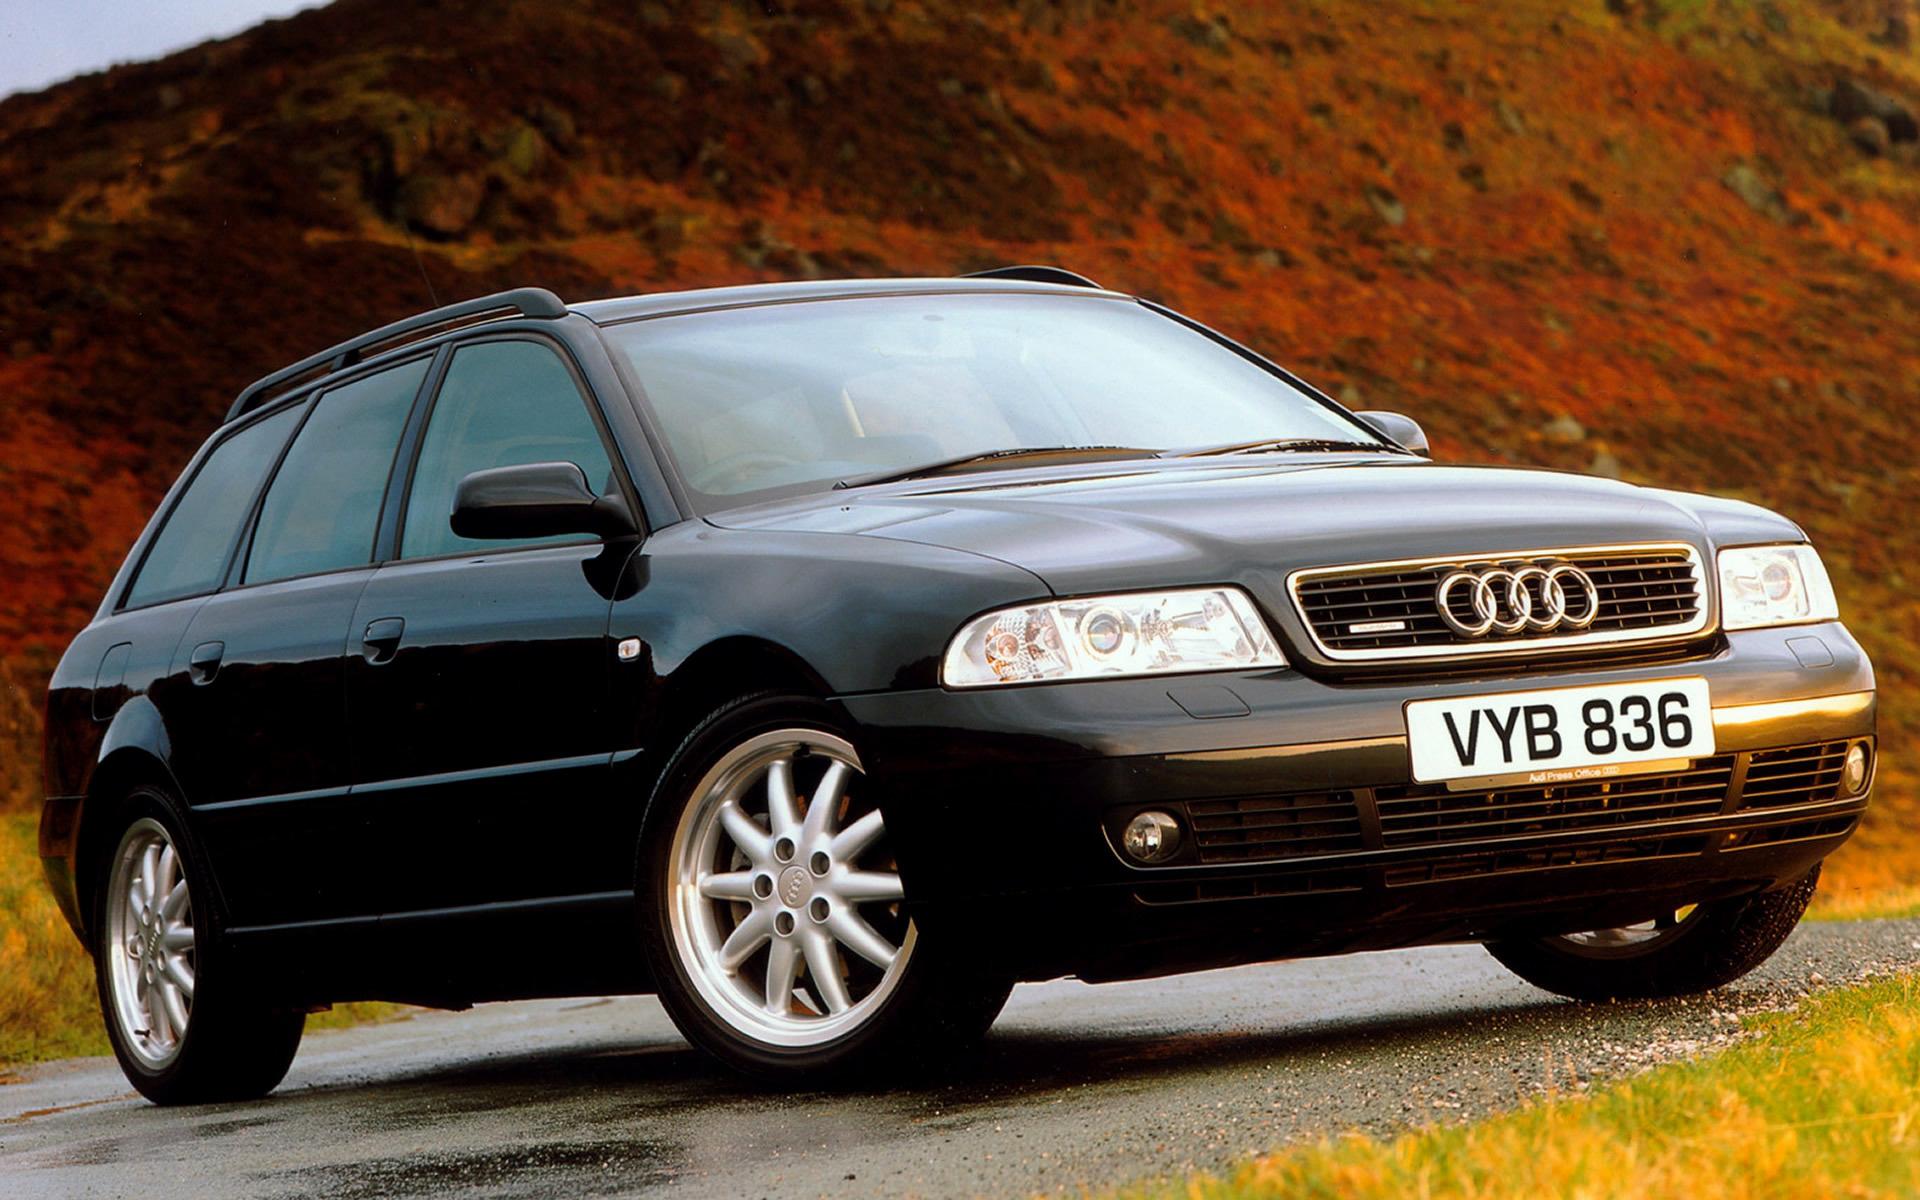 Audi A4 Avant UK 1999 carpixel